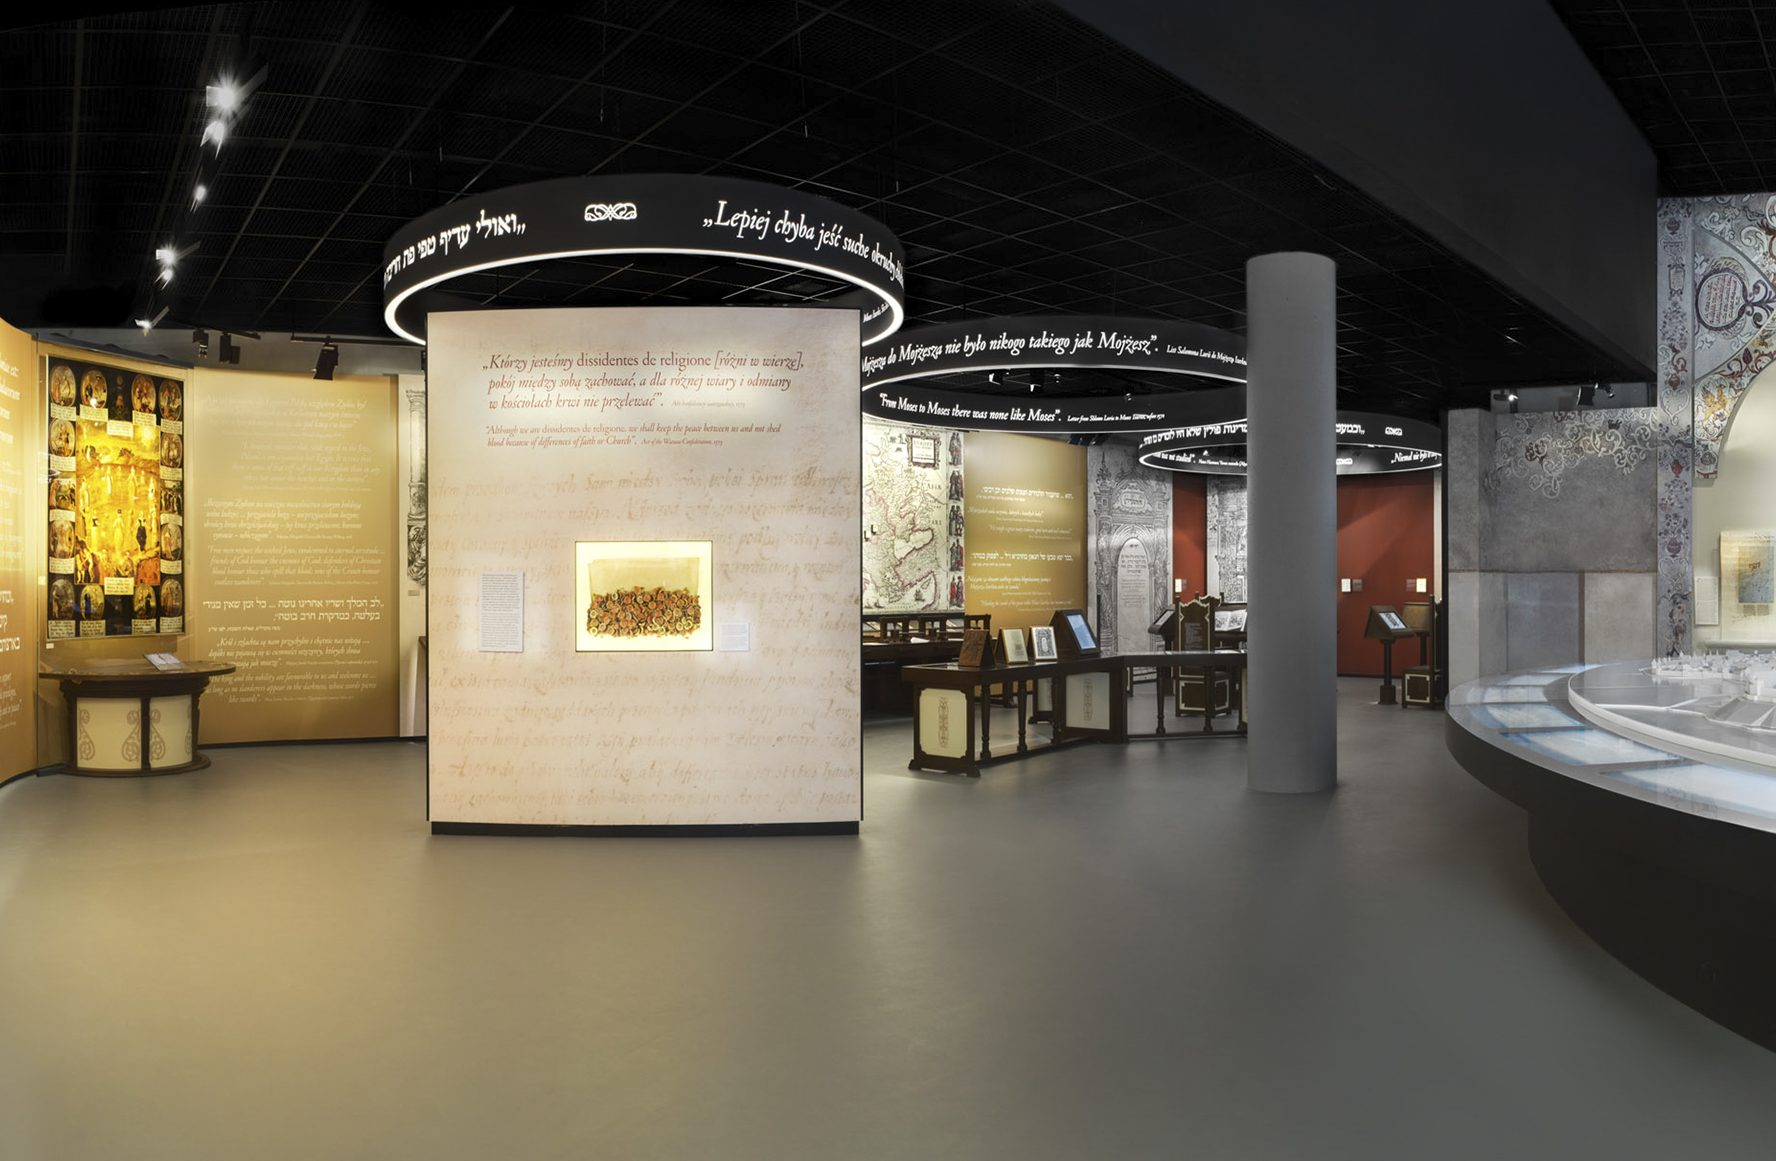 muzeum-historii-polskich_30291062562_o-e1532683199116